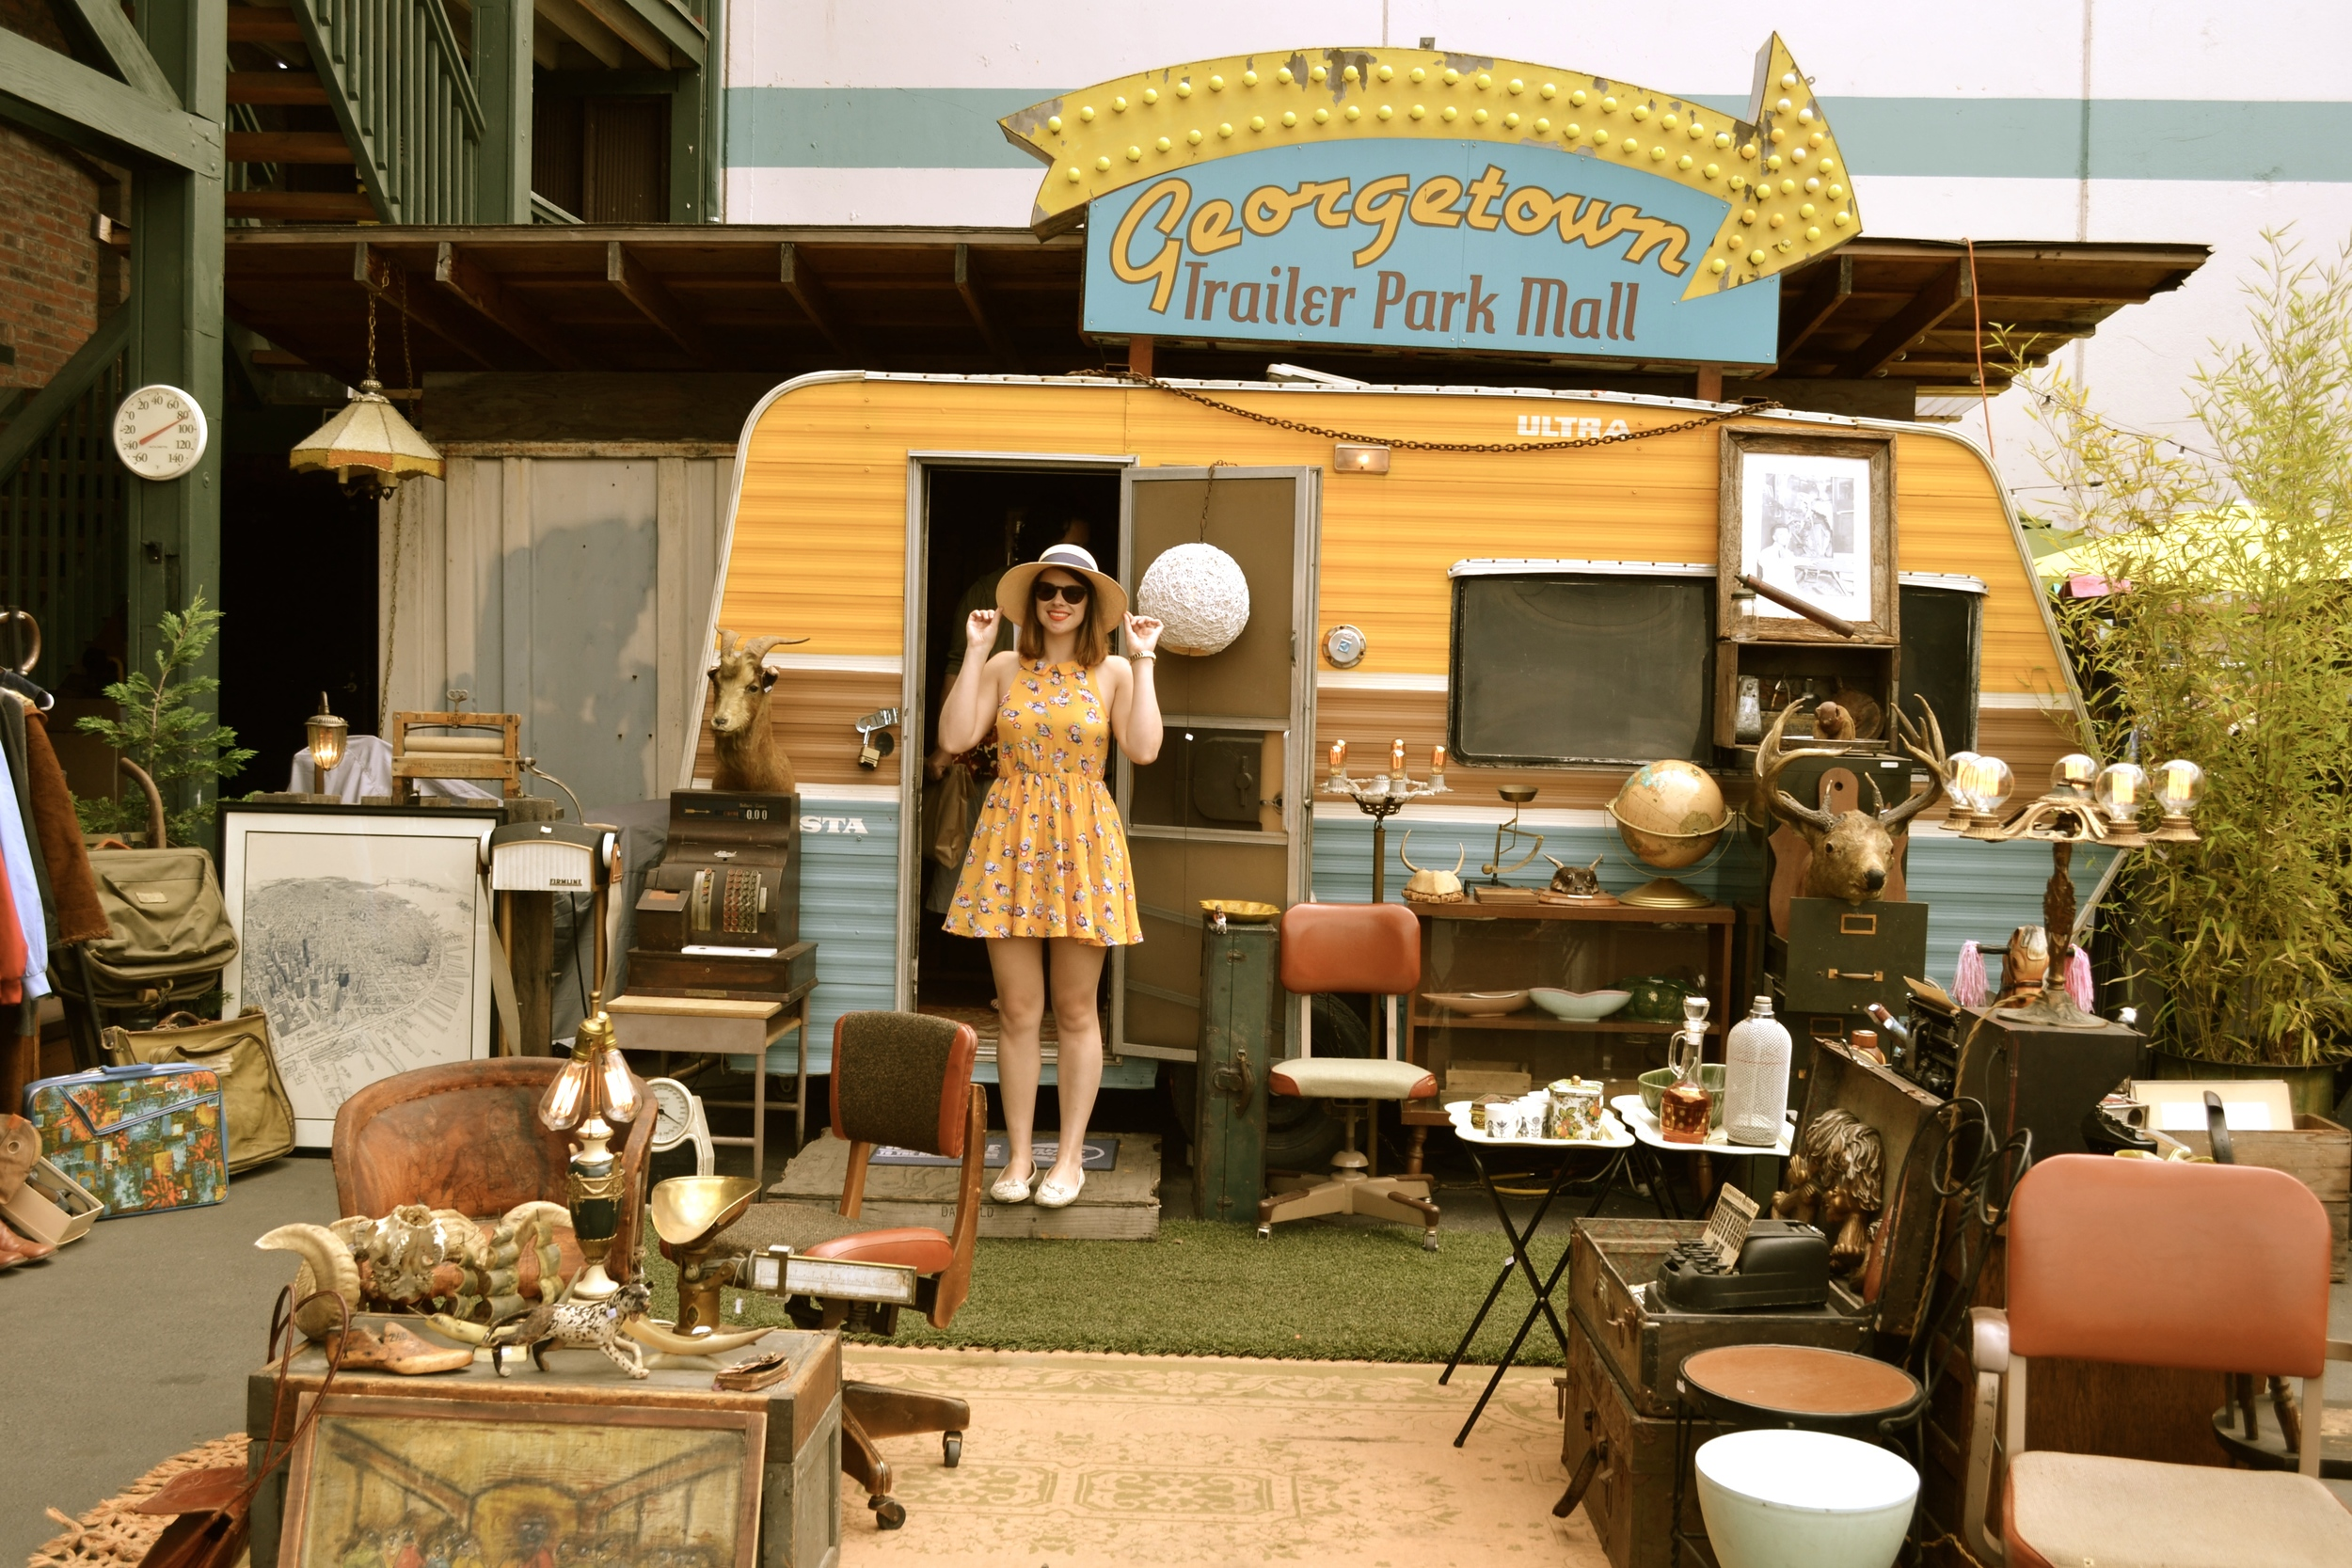 georgetown-trailer-park-mall-seattle